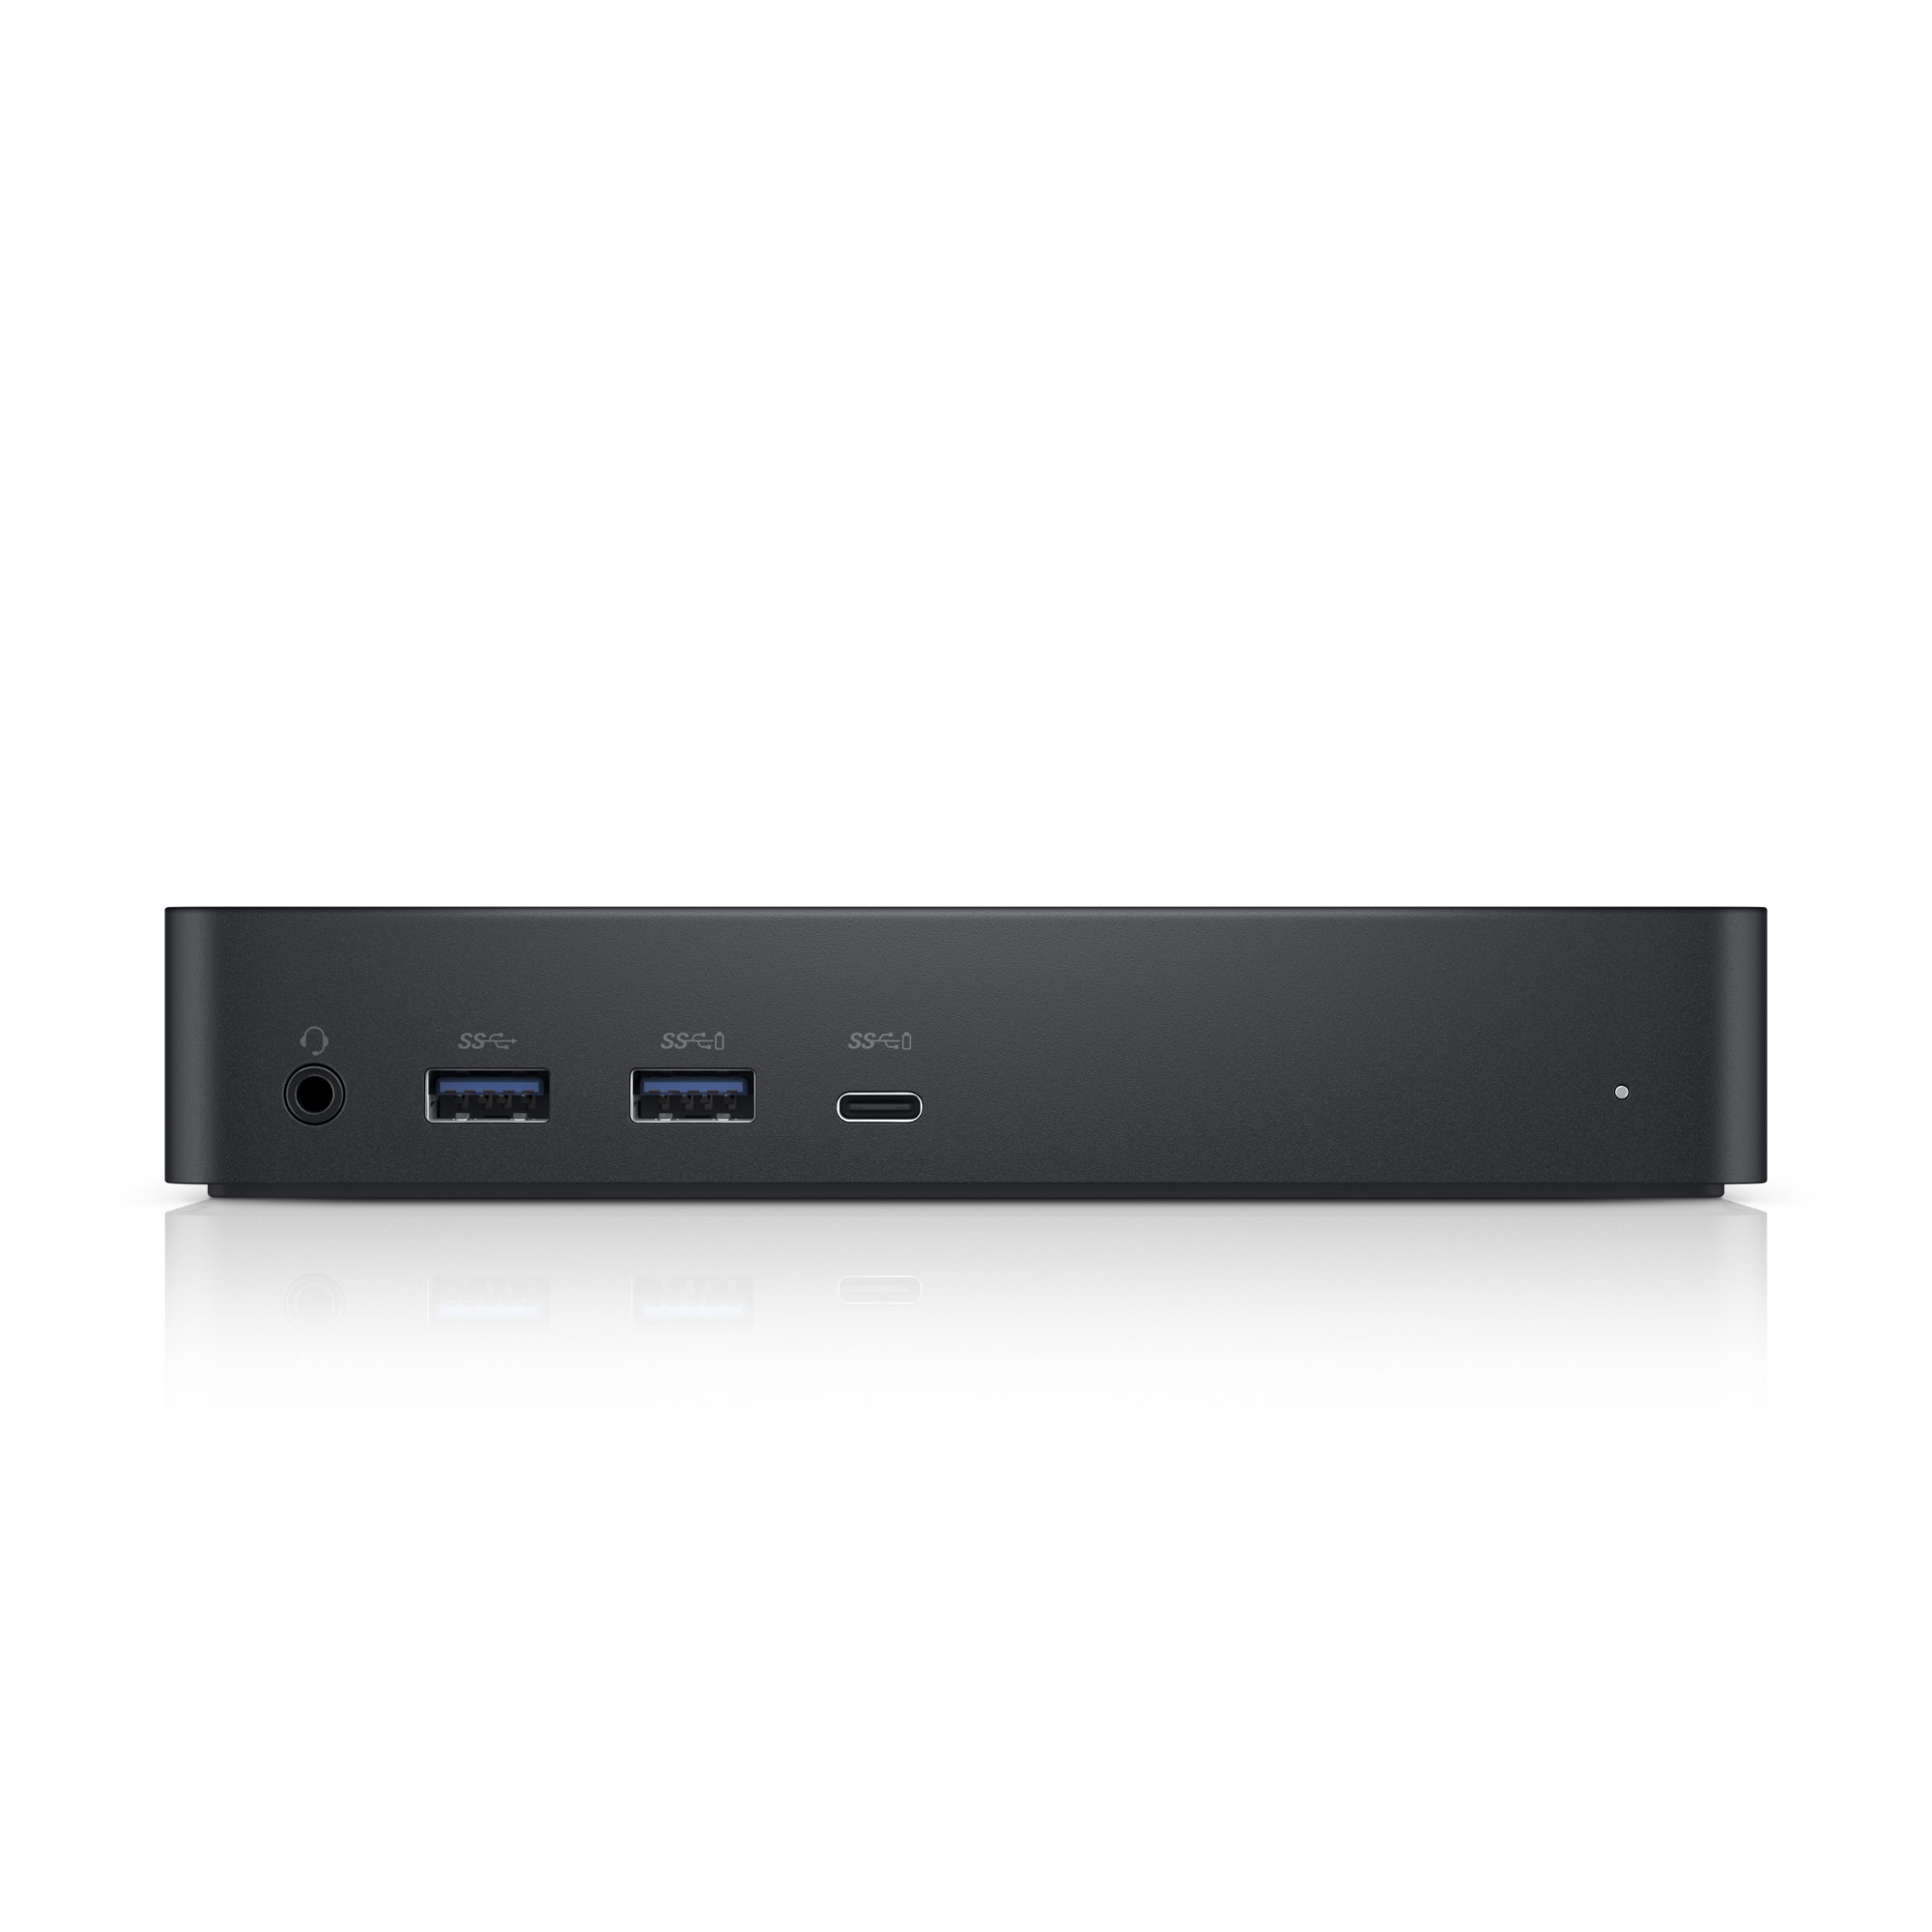 DELL D6000 Wired USB 3 0 (3 1 Gen 1) Type-C Black